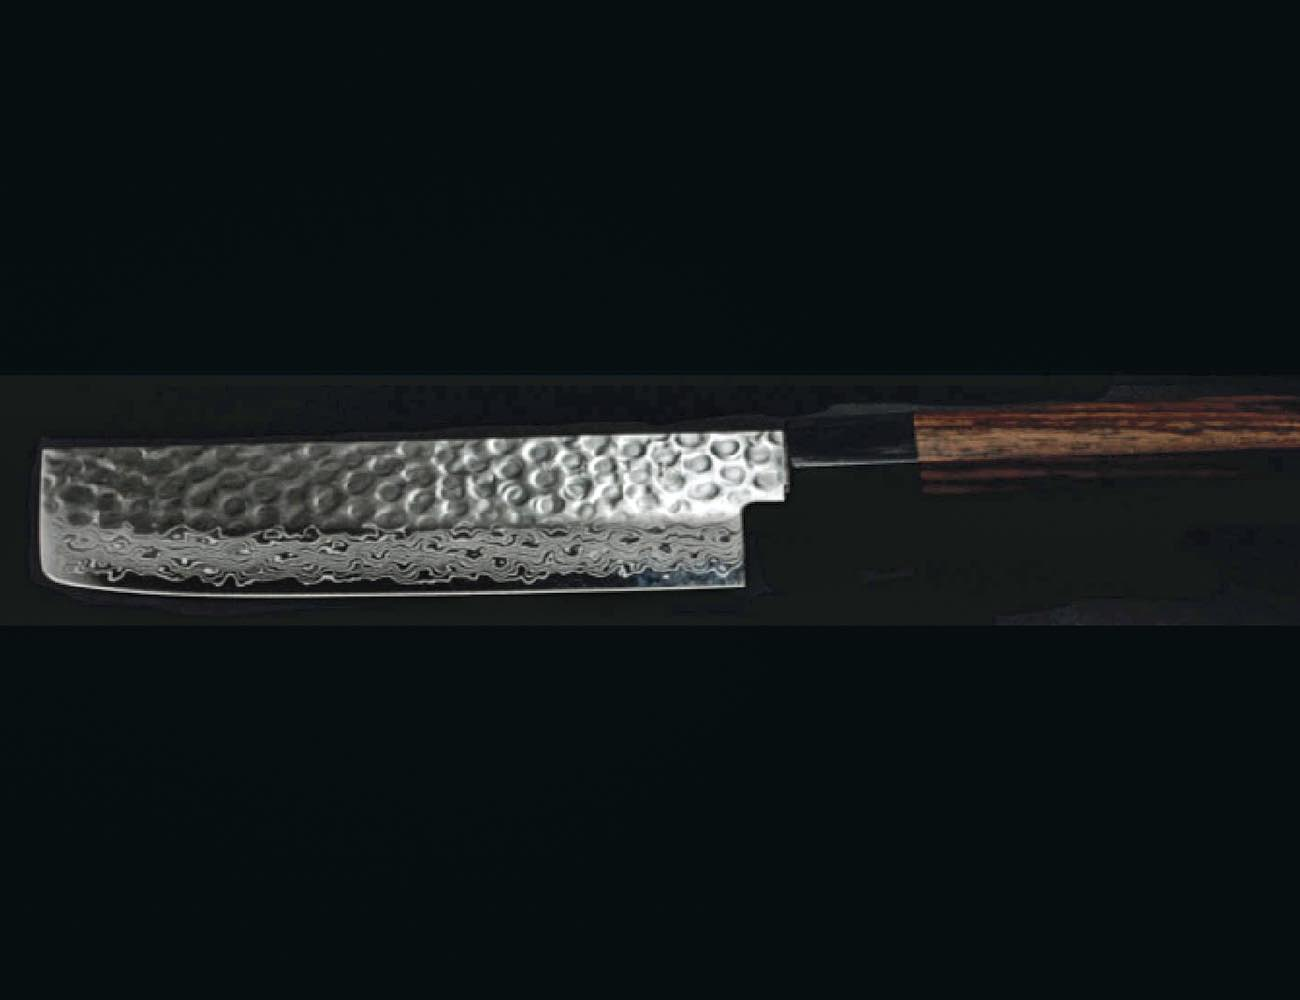 KATURA Premium Japanese Knife Collection